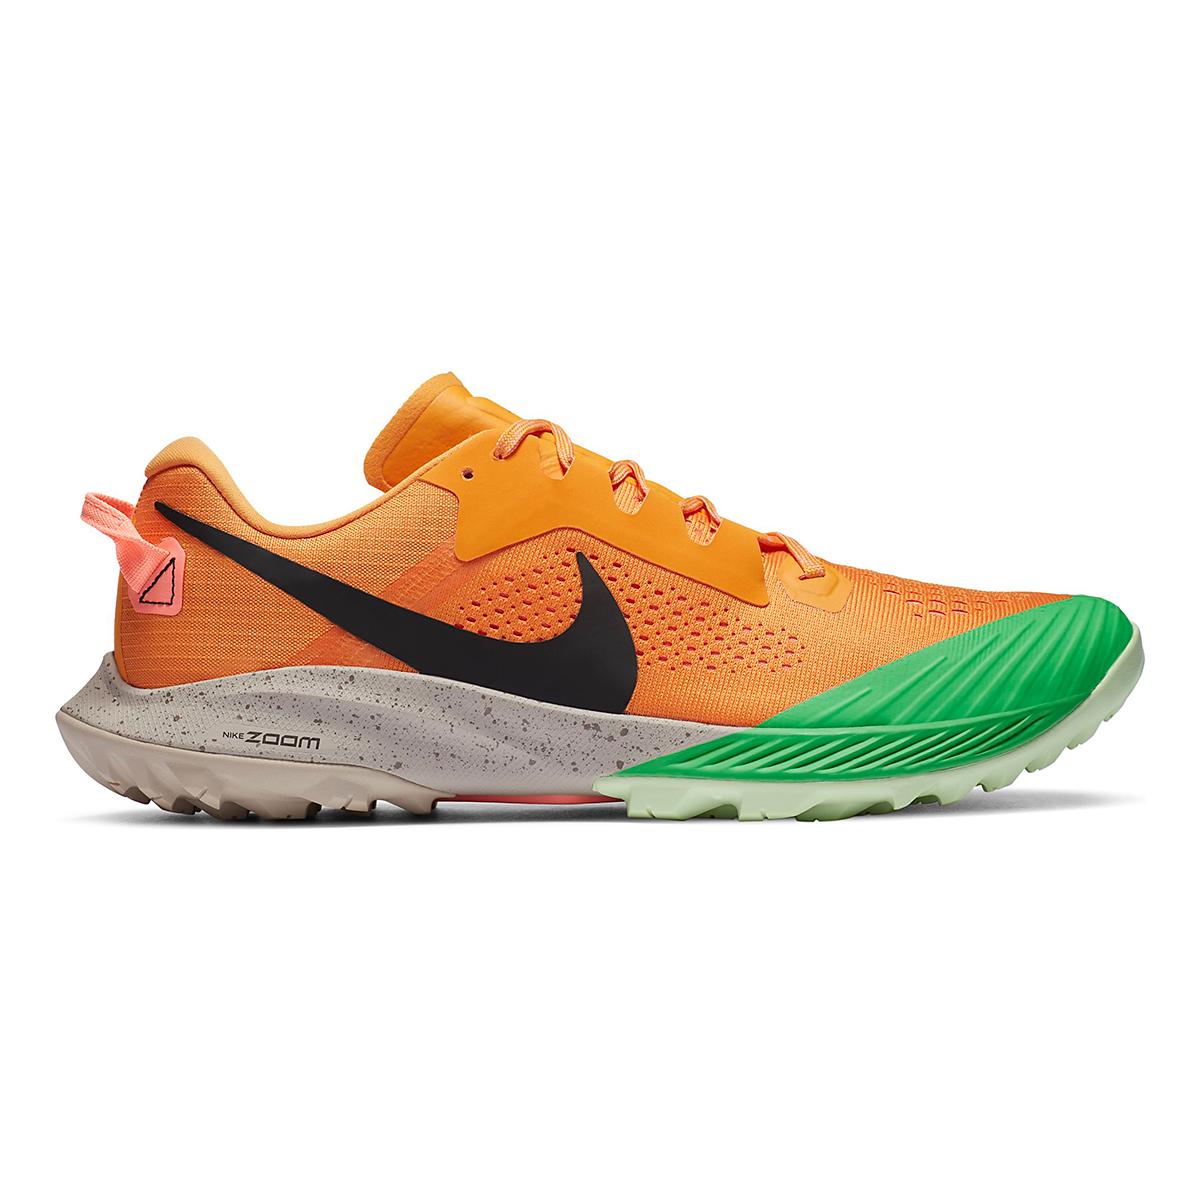 Men's Nike Air Zoom Terra Kiger 6 Trail Running Shoe - Color: Kumquat/Black/Pink Green Spark - Size: 6 - Width: Regular, Kumquat/Black/Pink Green Spark, large, image 1